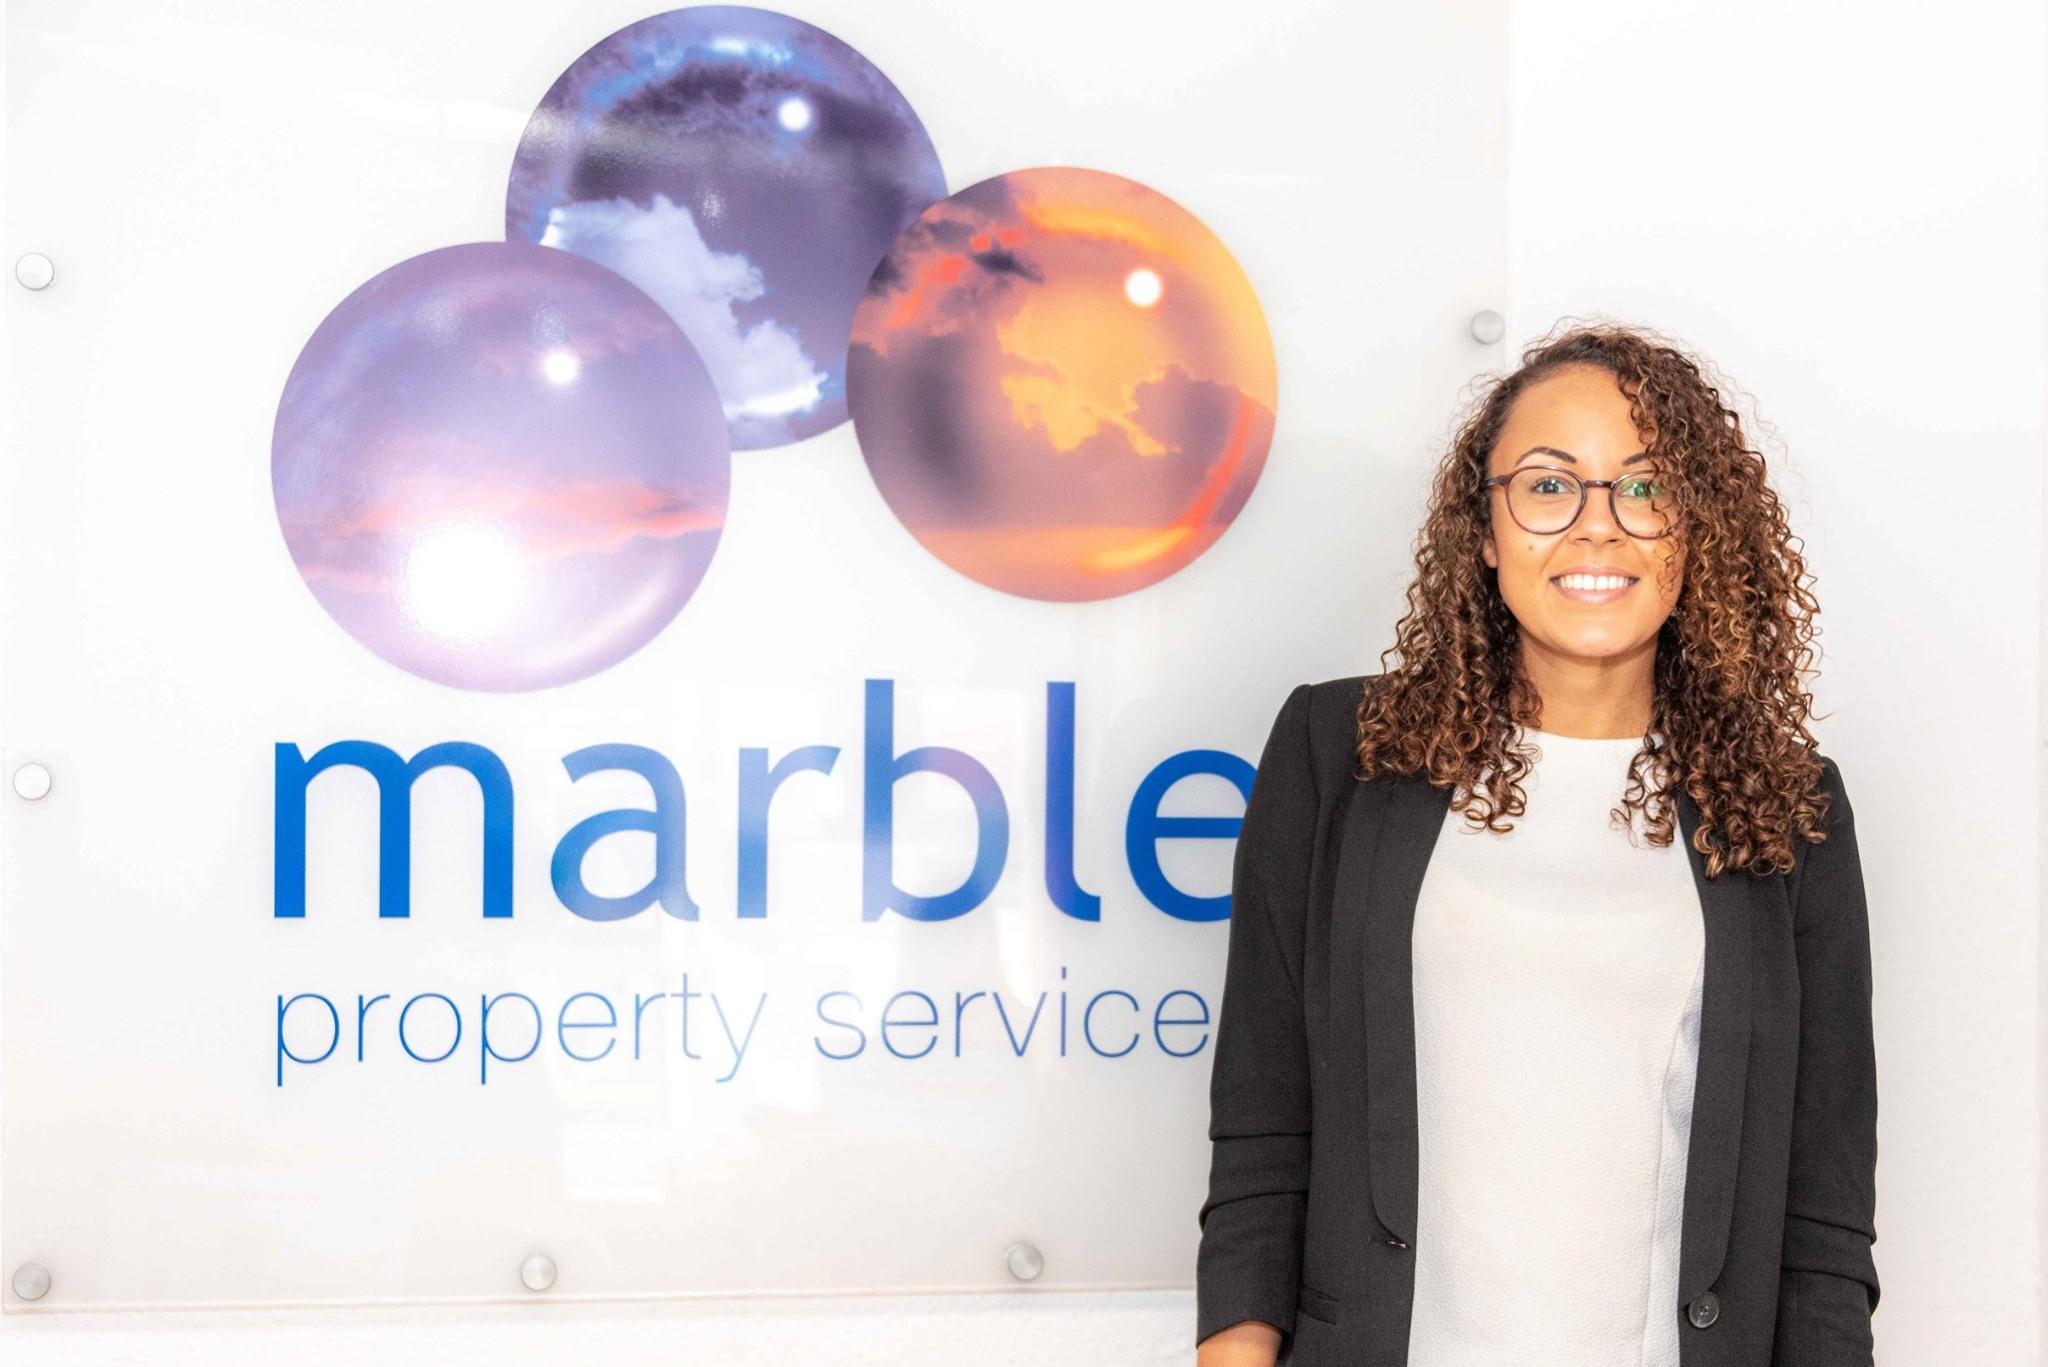 Derbyshire Property Expert Urges Reluctant Landlords to Let, Let, Let Following Local Rental Boom